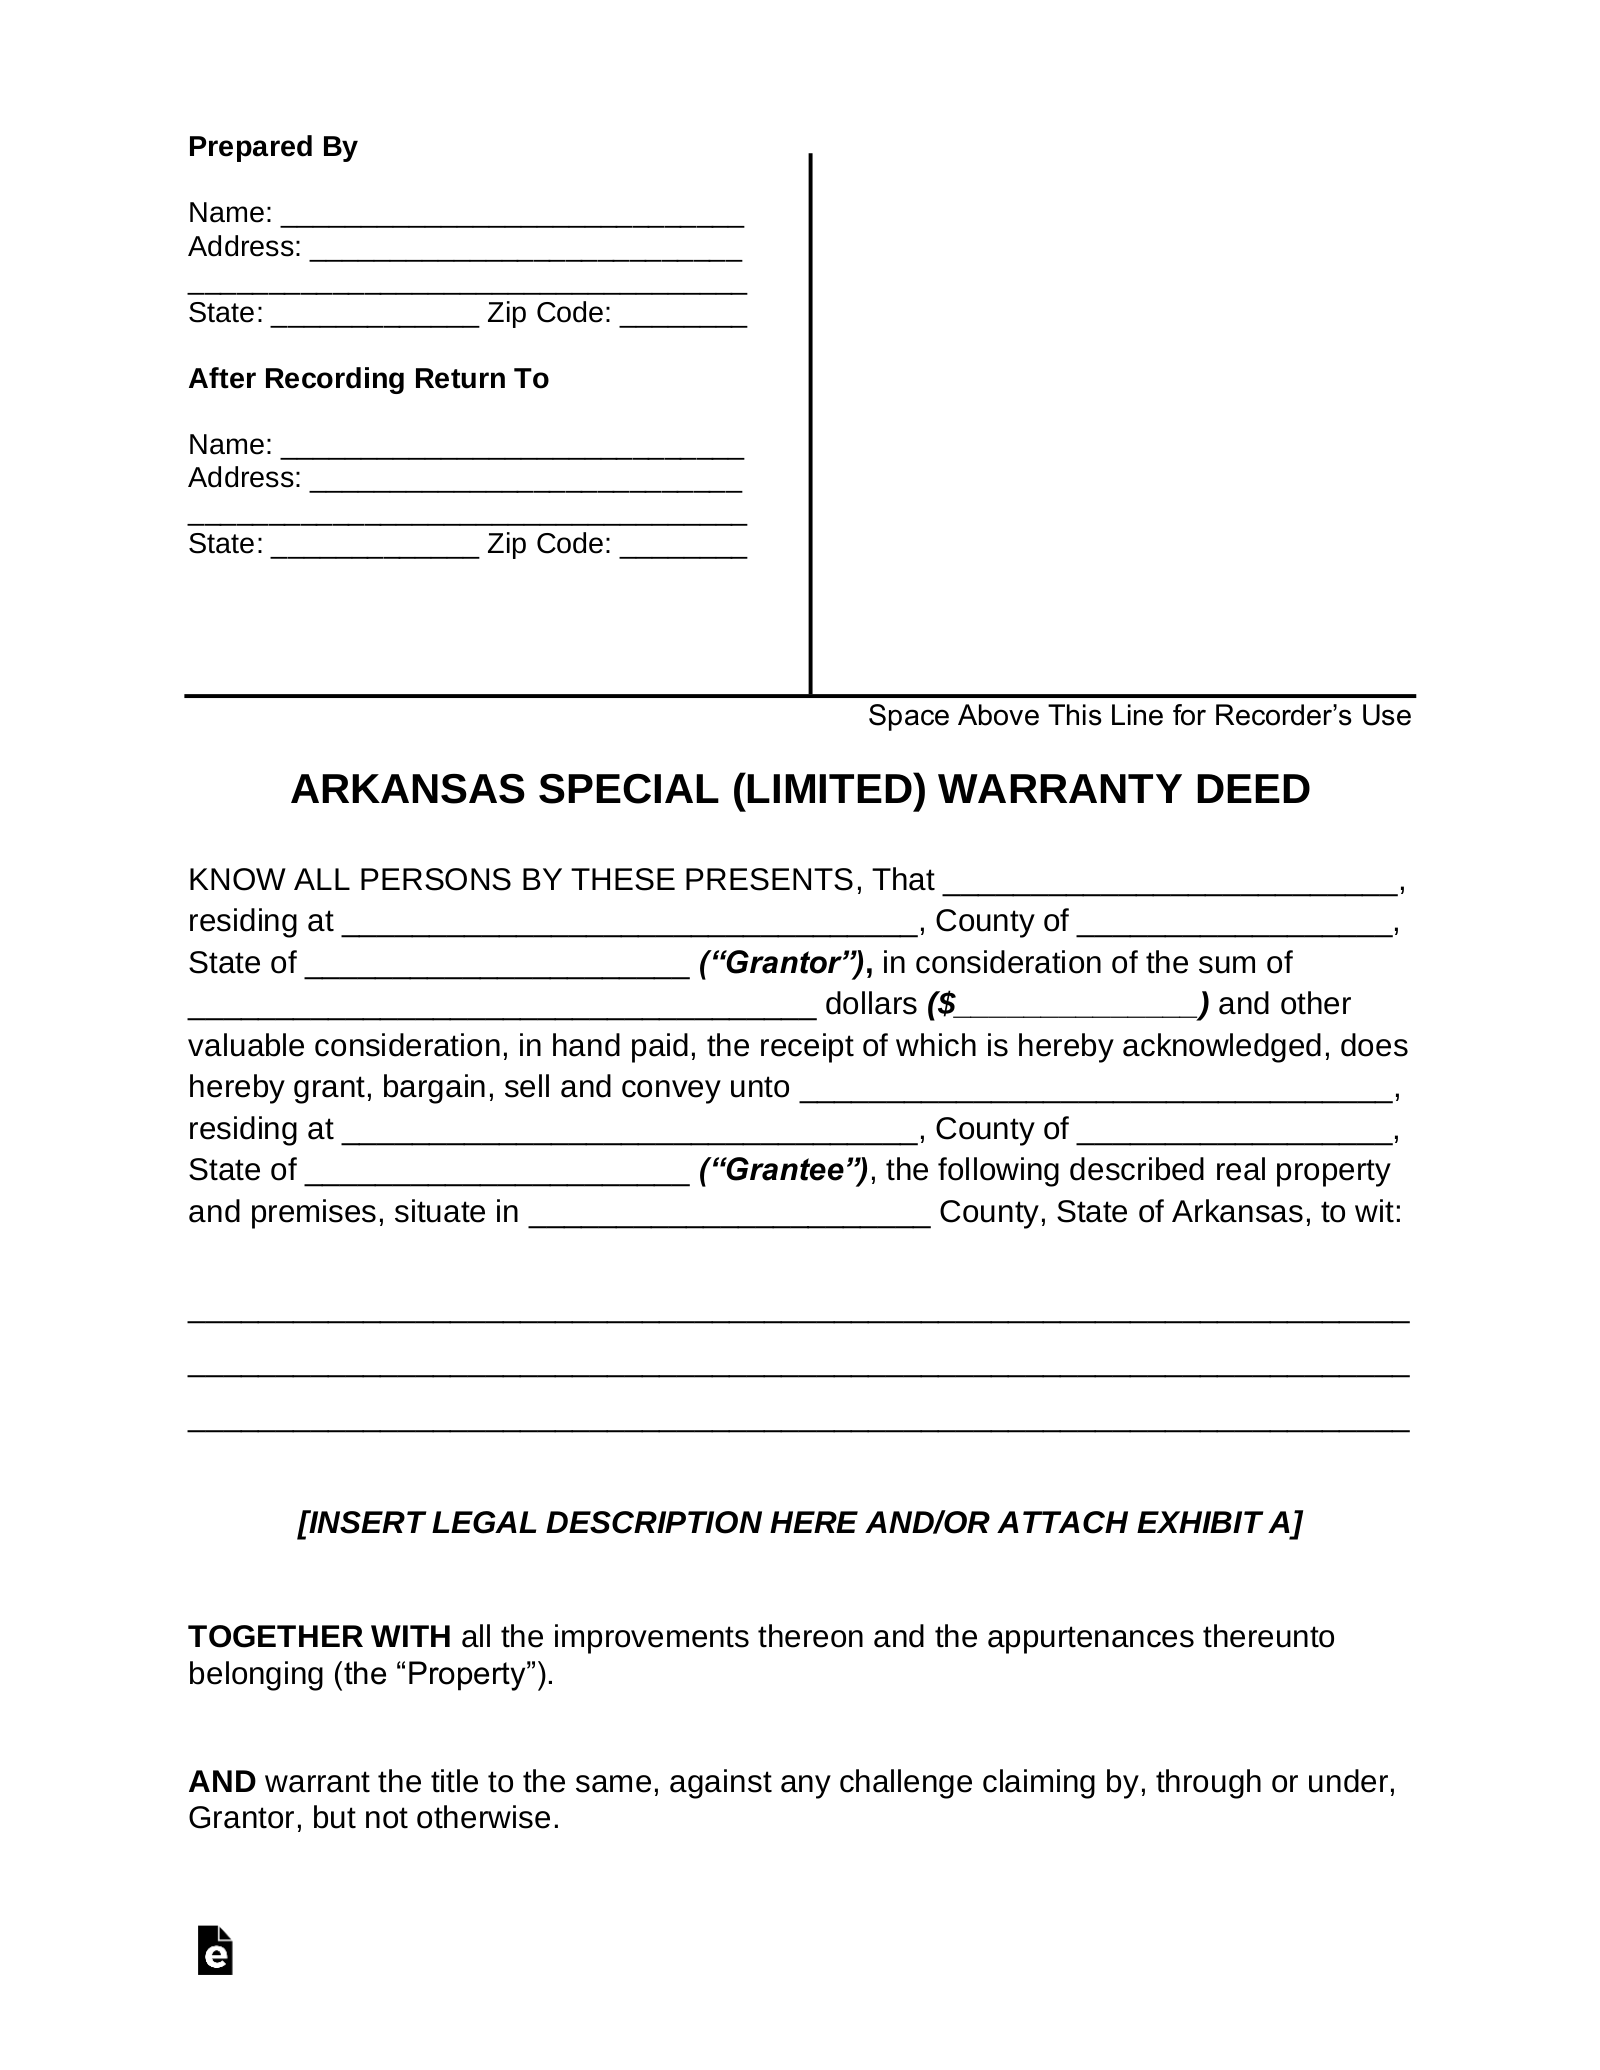 quick claim deed form arkansas  Free Arkansas Special Warranty Deed Form - PDF | Word ...